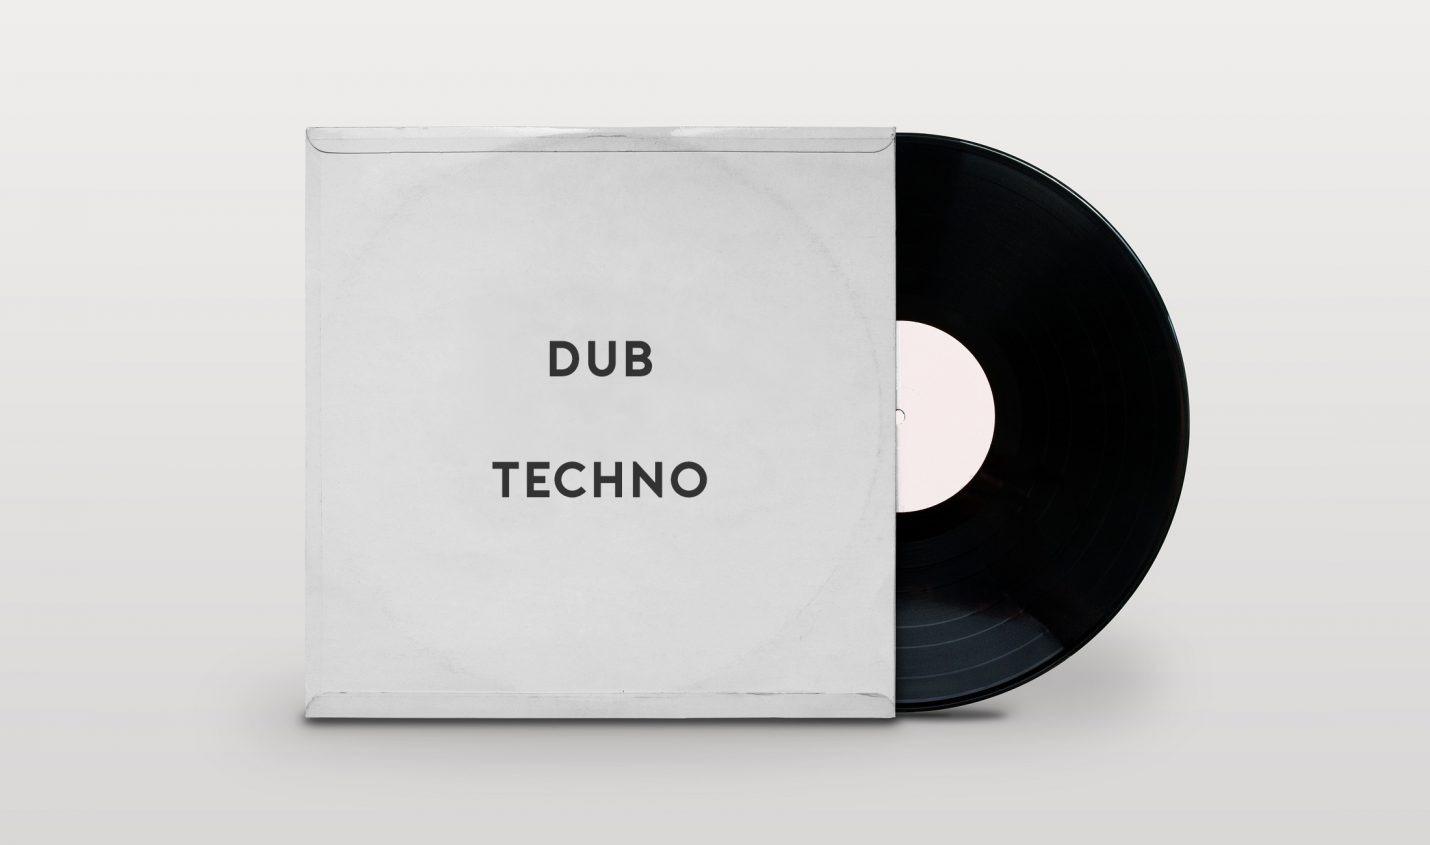 Essentials: Dub Techno